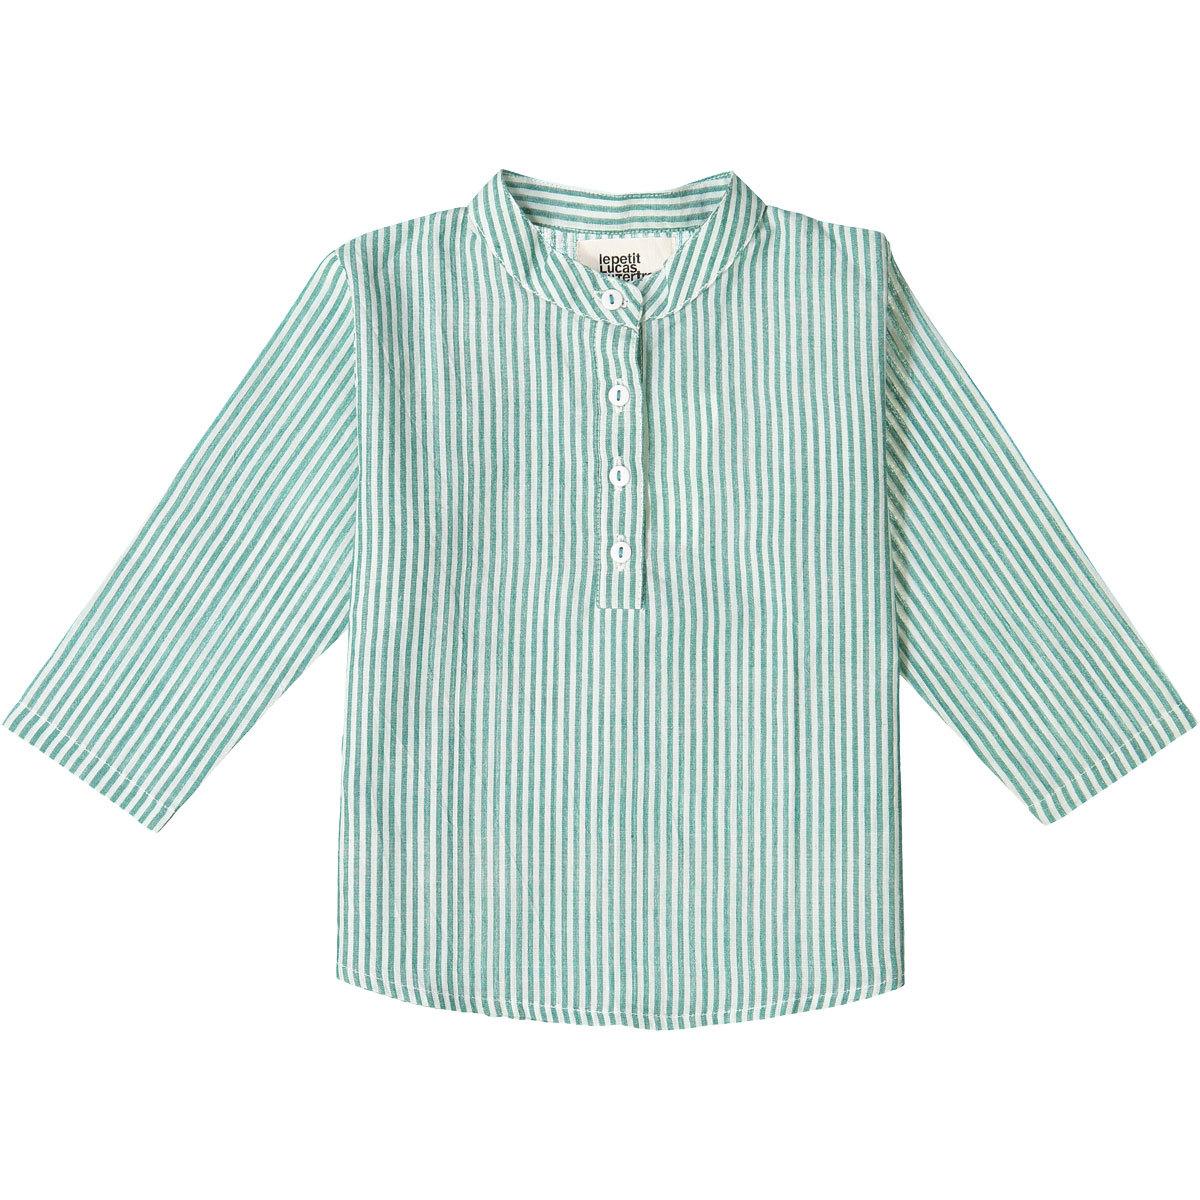 Hauts bébé Blouse Kurta - Stripes - 3 Ans Blouse Kurta - Stripes - 3 Ans